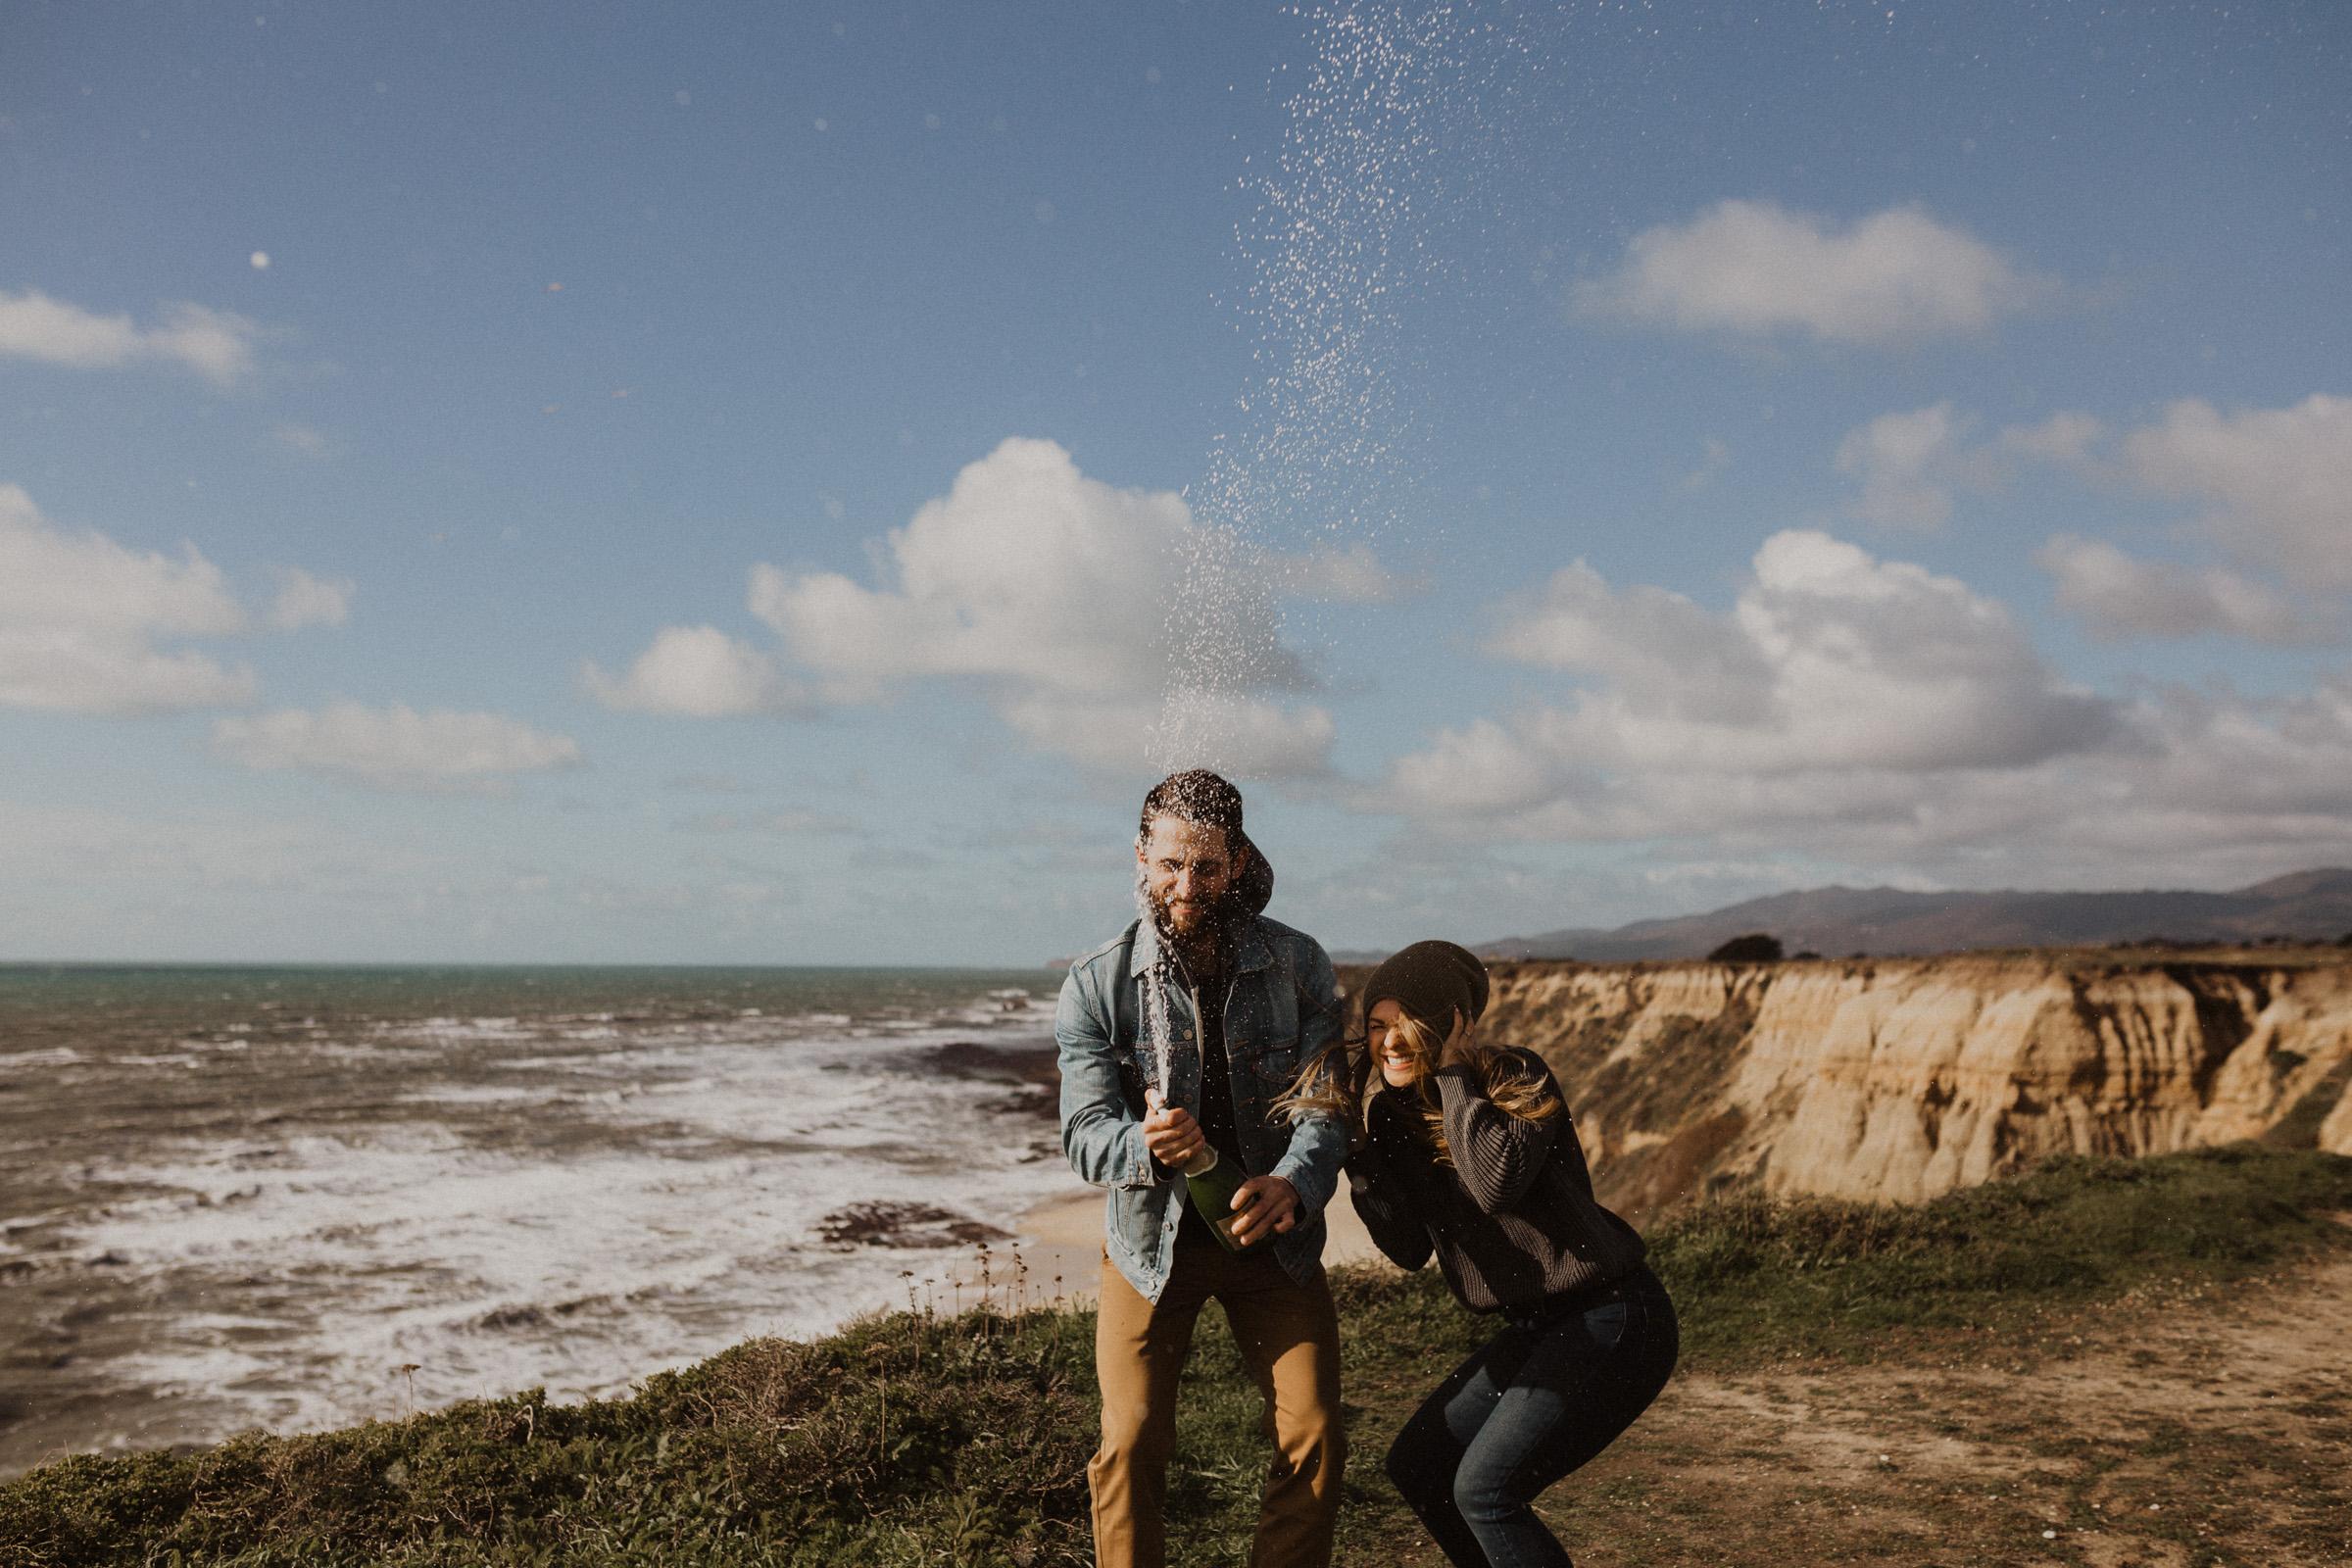 alyssa barletter photography santa cruz beach engagement california photographer-16.jpg